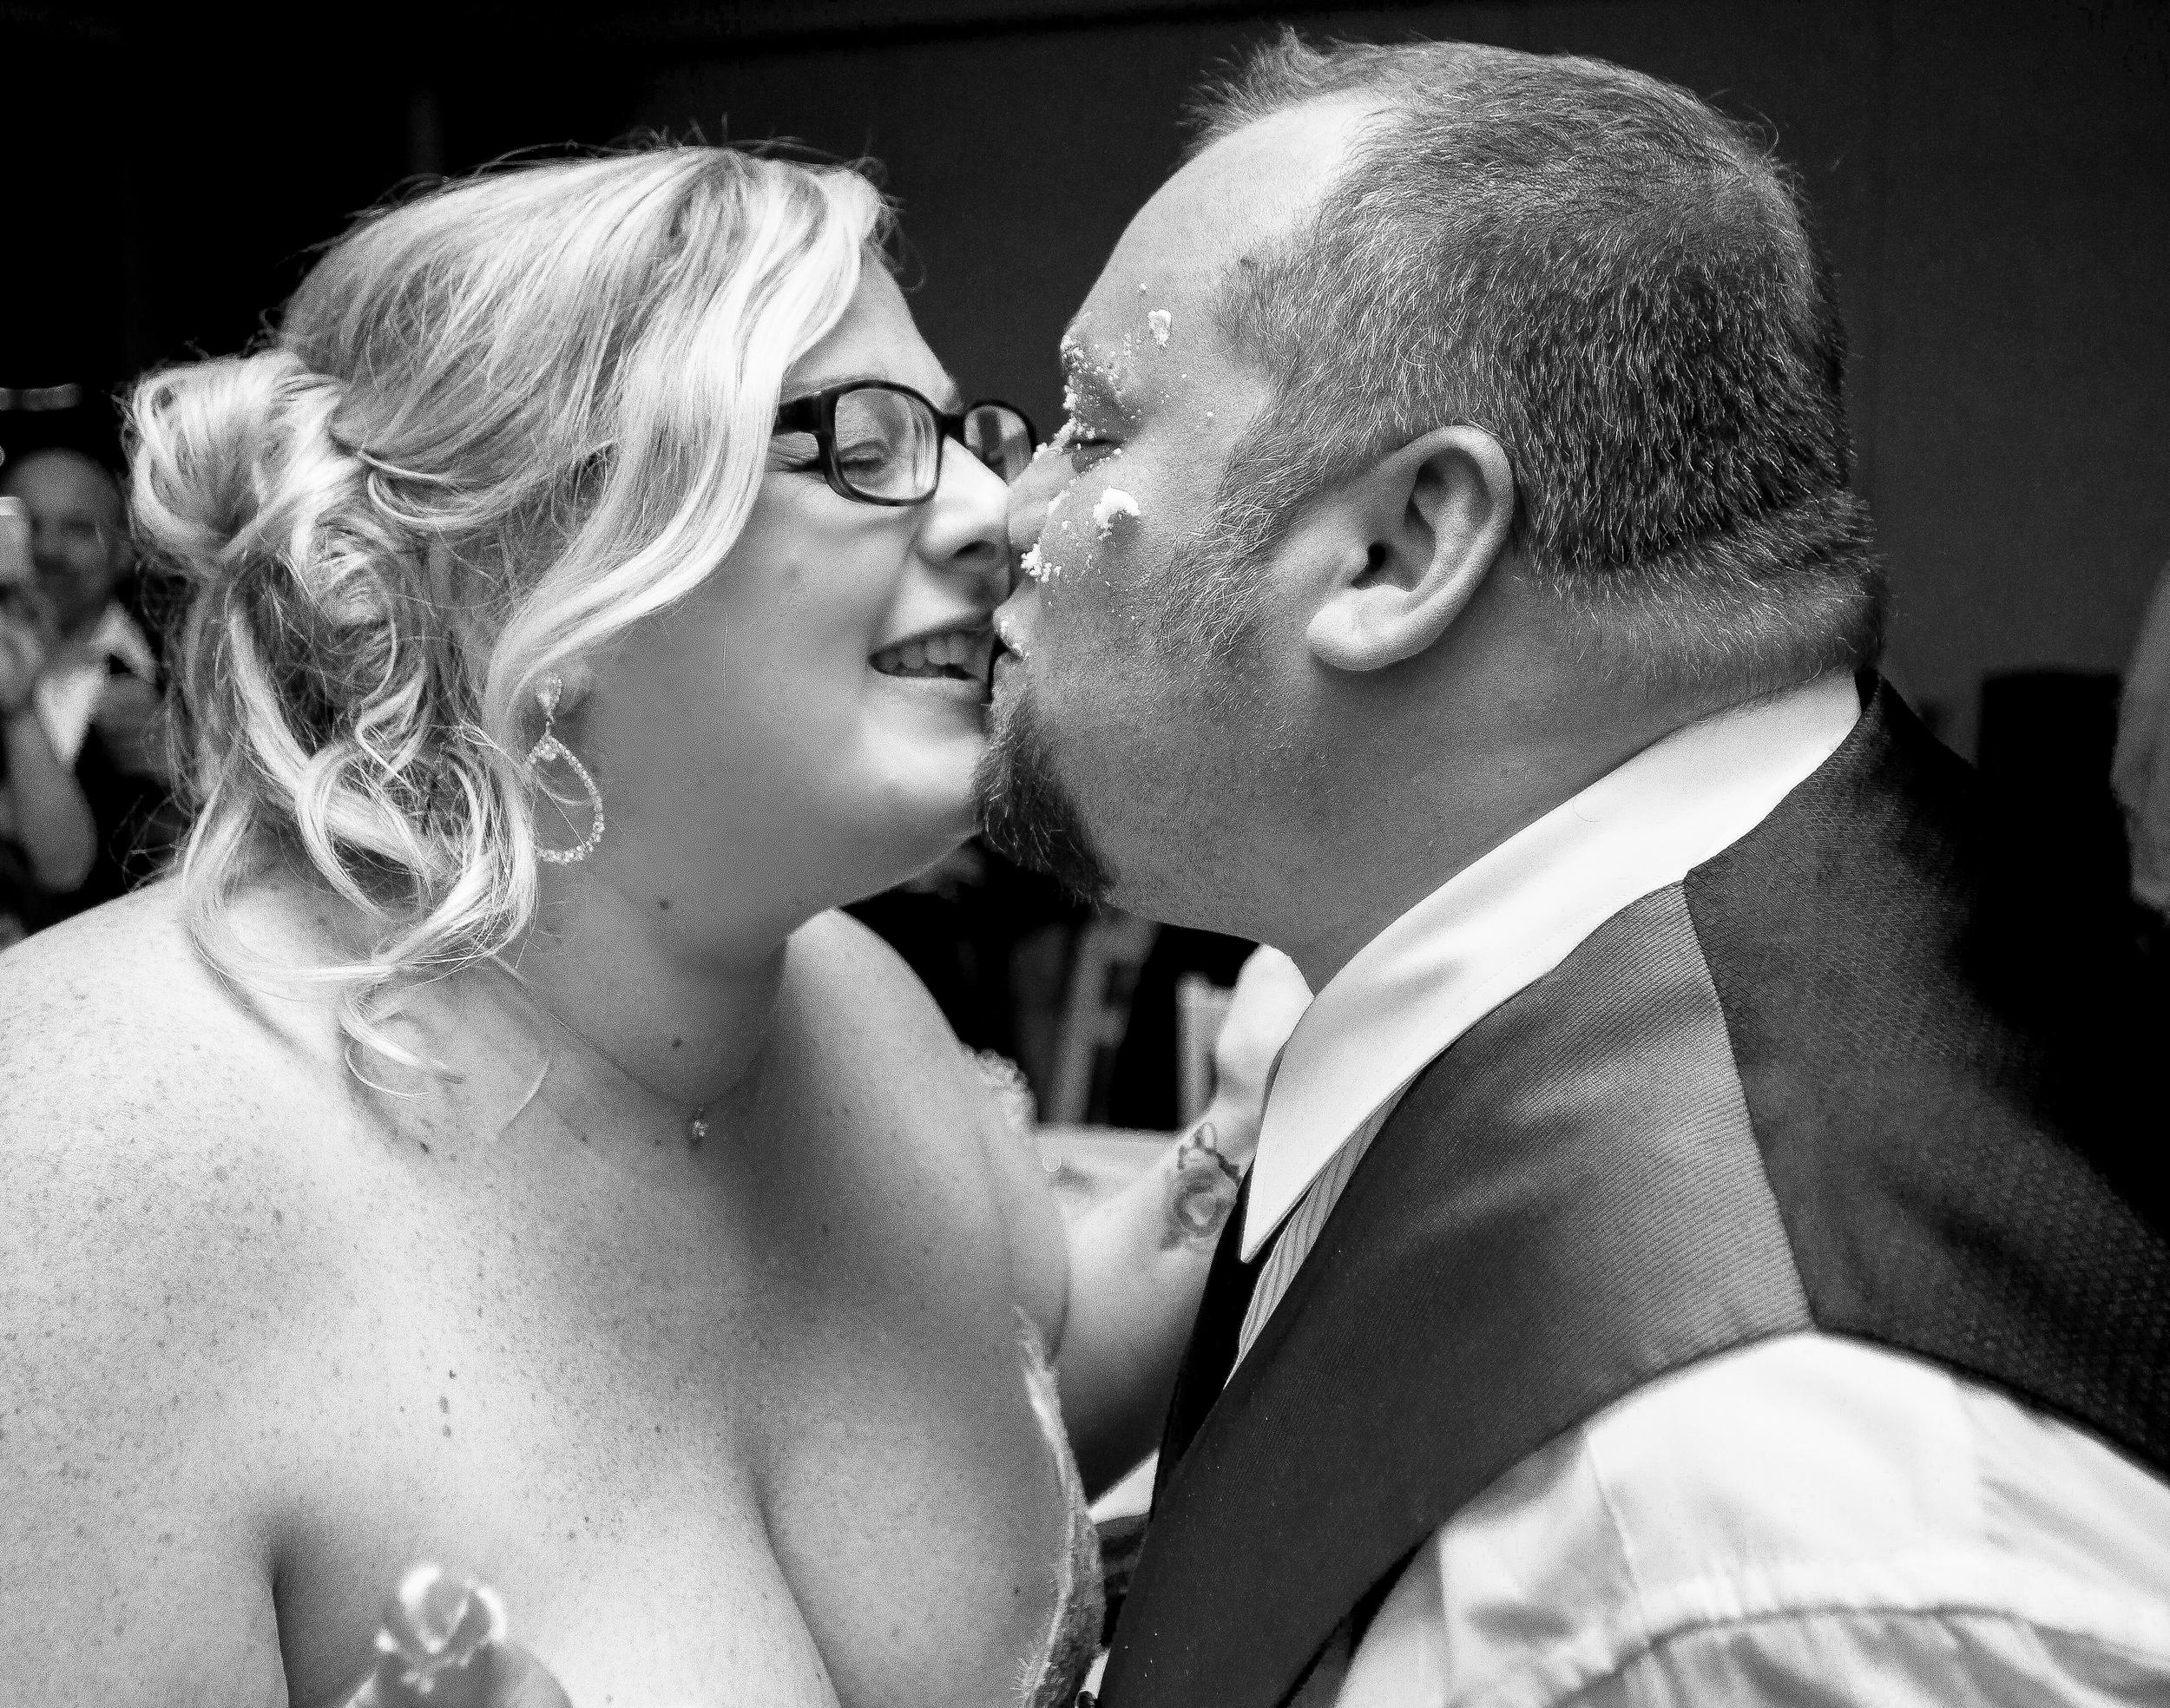 WeddingWebsite1.jpg